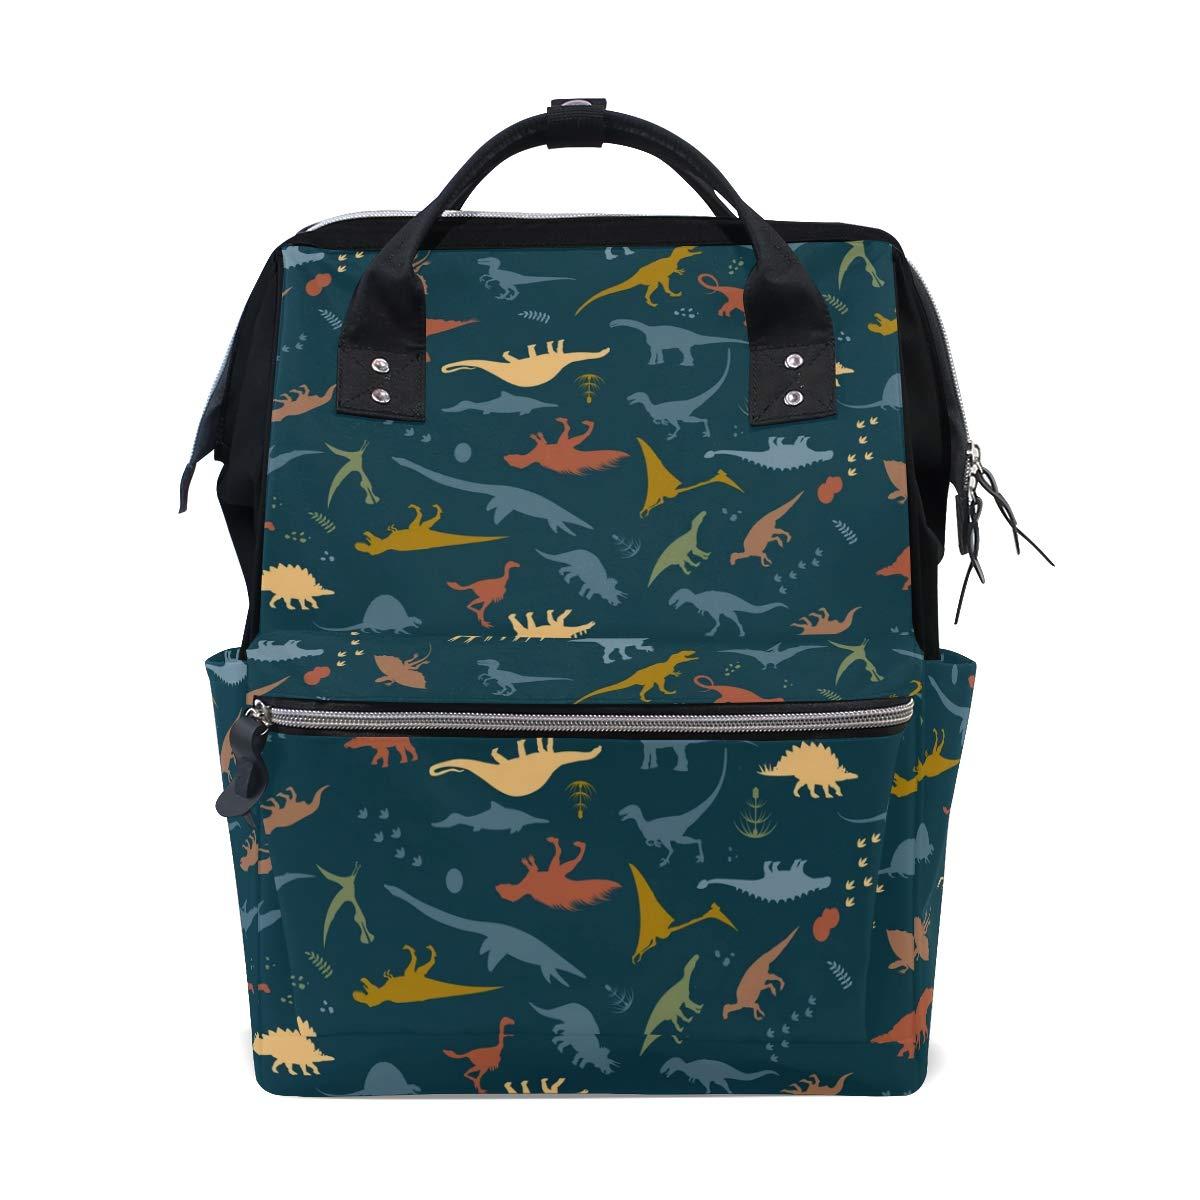 MERRYSUGAR Diaper Bag Backpack Travel Bag Large Multifunction Waterproof Dinosaur Animal Stylish and Durable Nappy Bag for Baby Care School Backpack